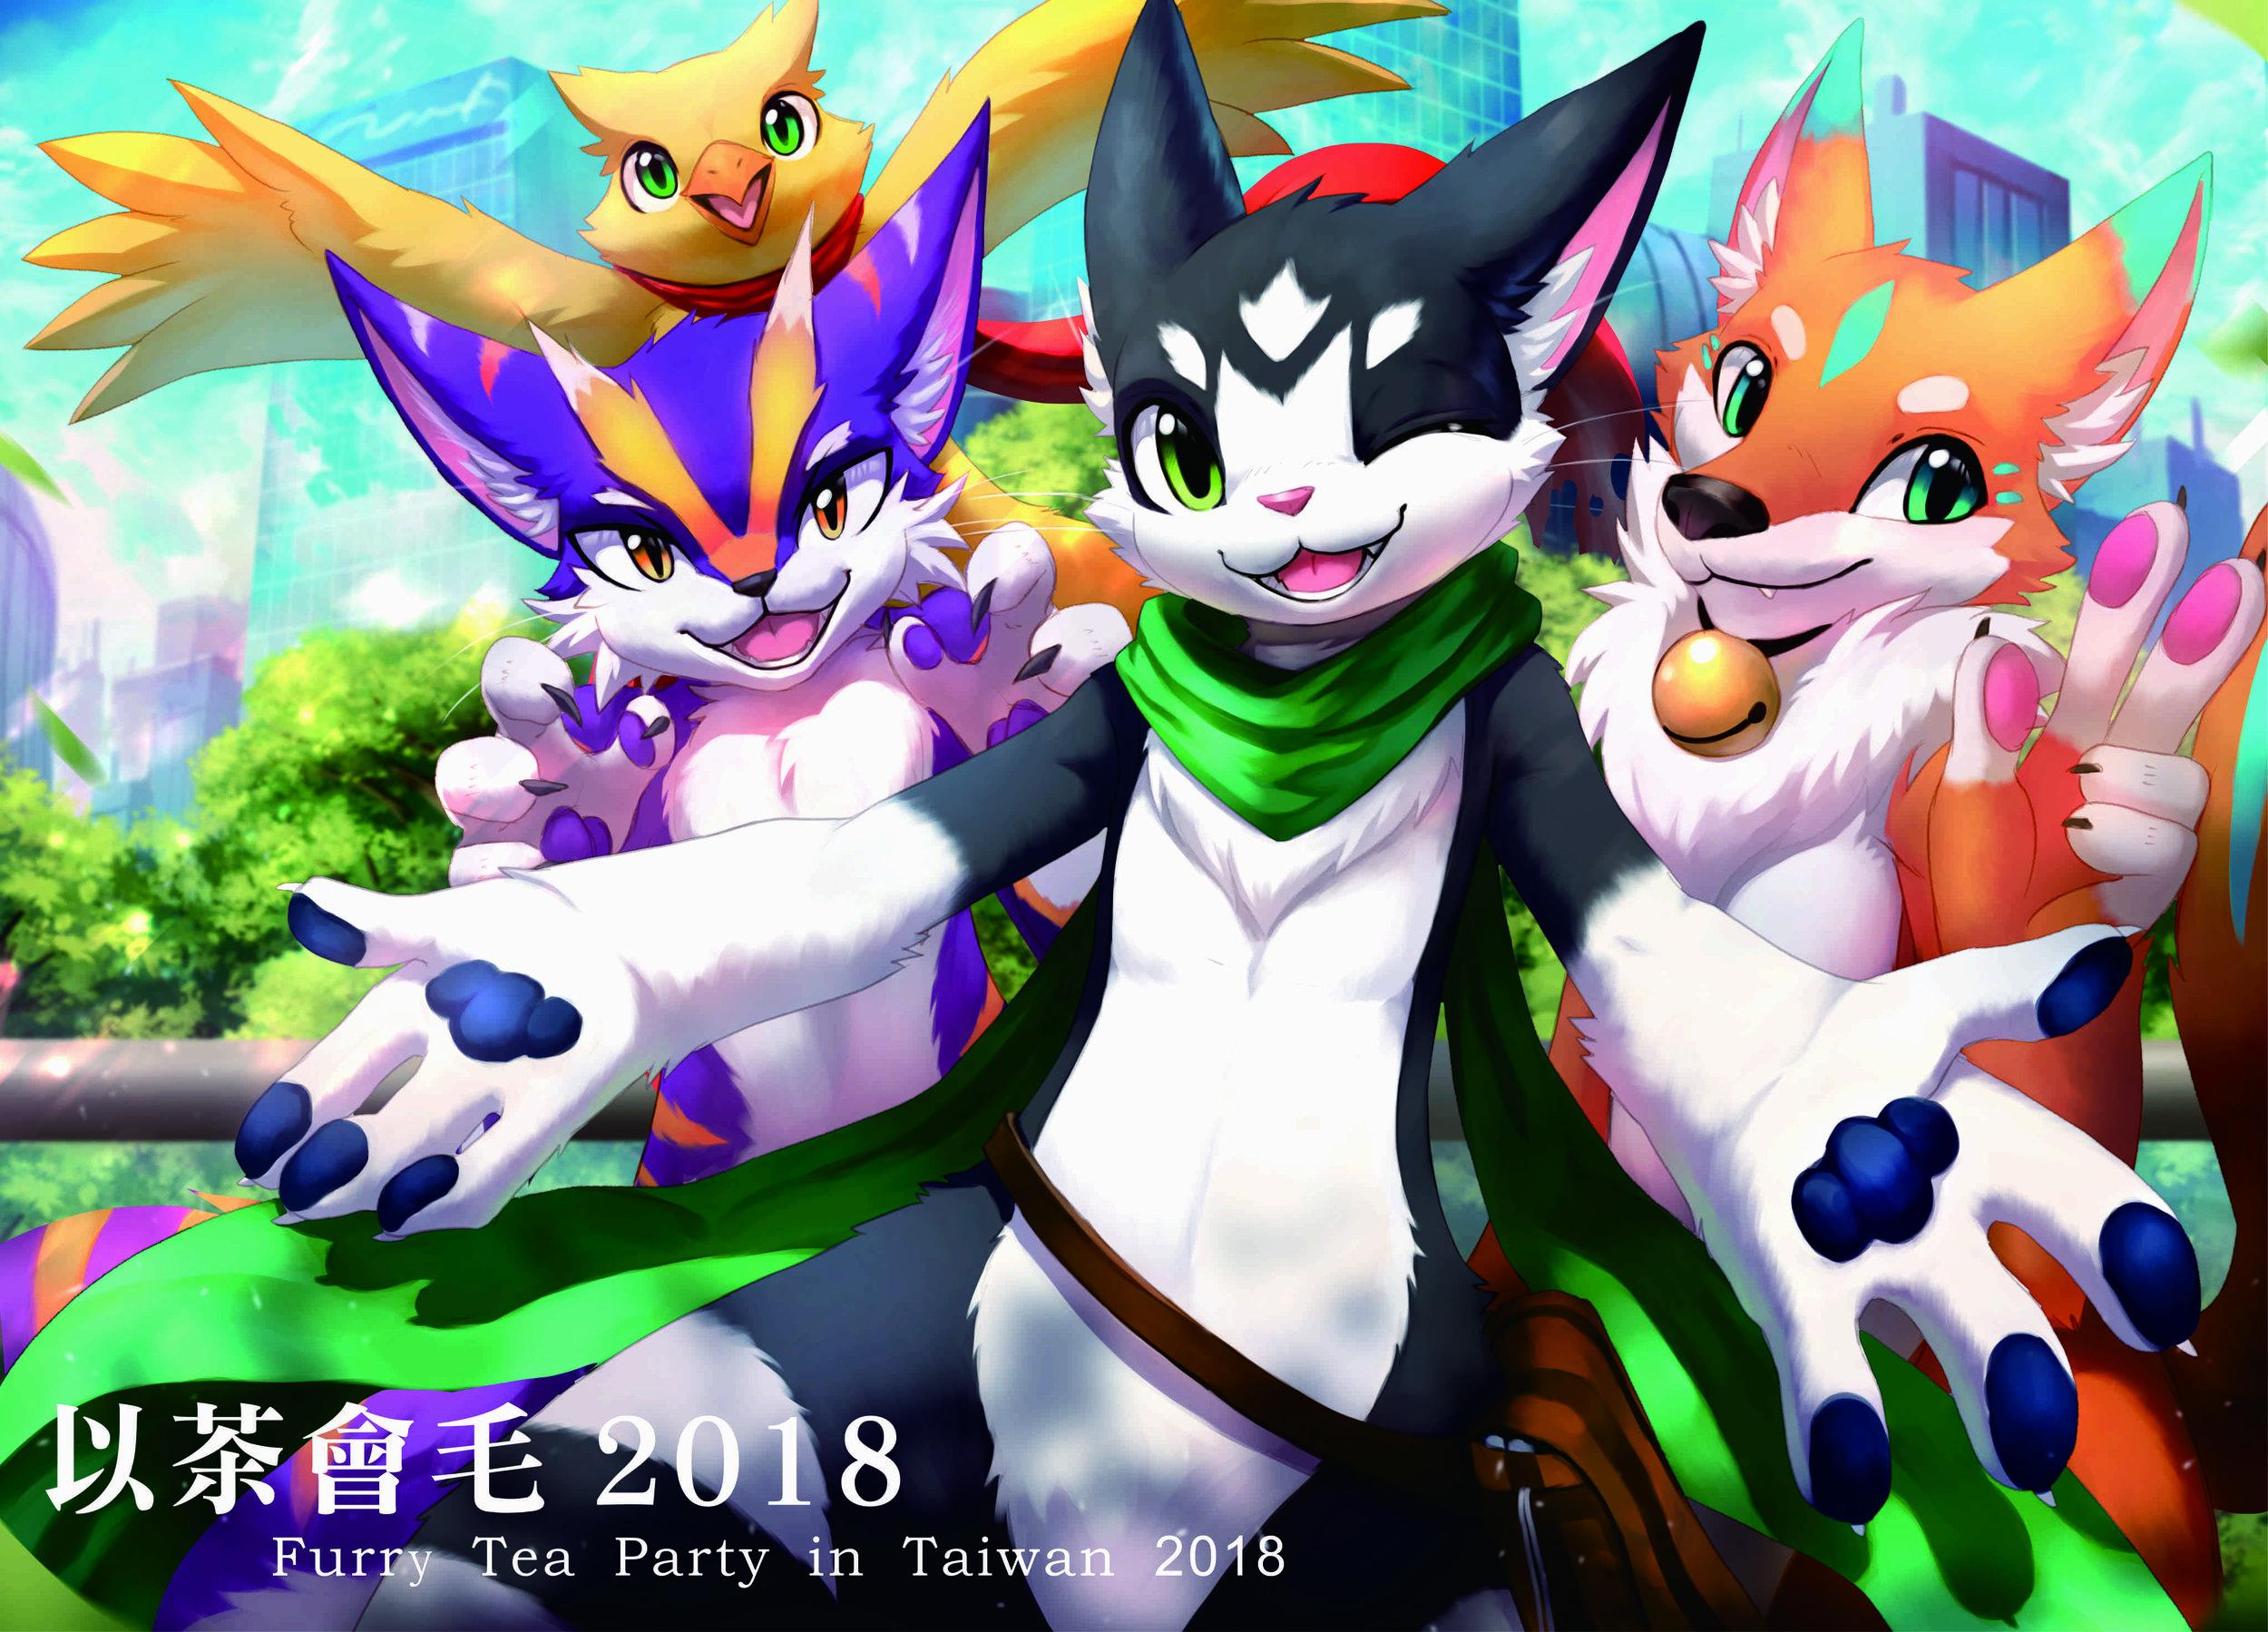 以茶會毛 2018 - Furry Tea Party in Taiwan 2018